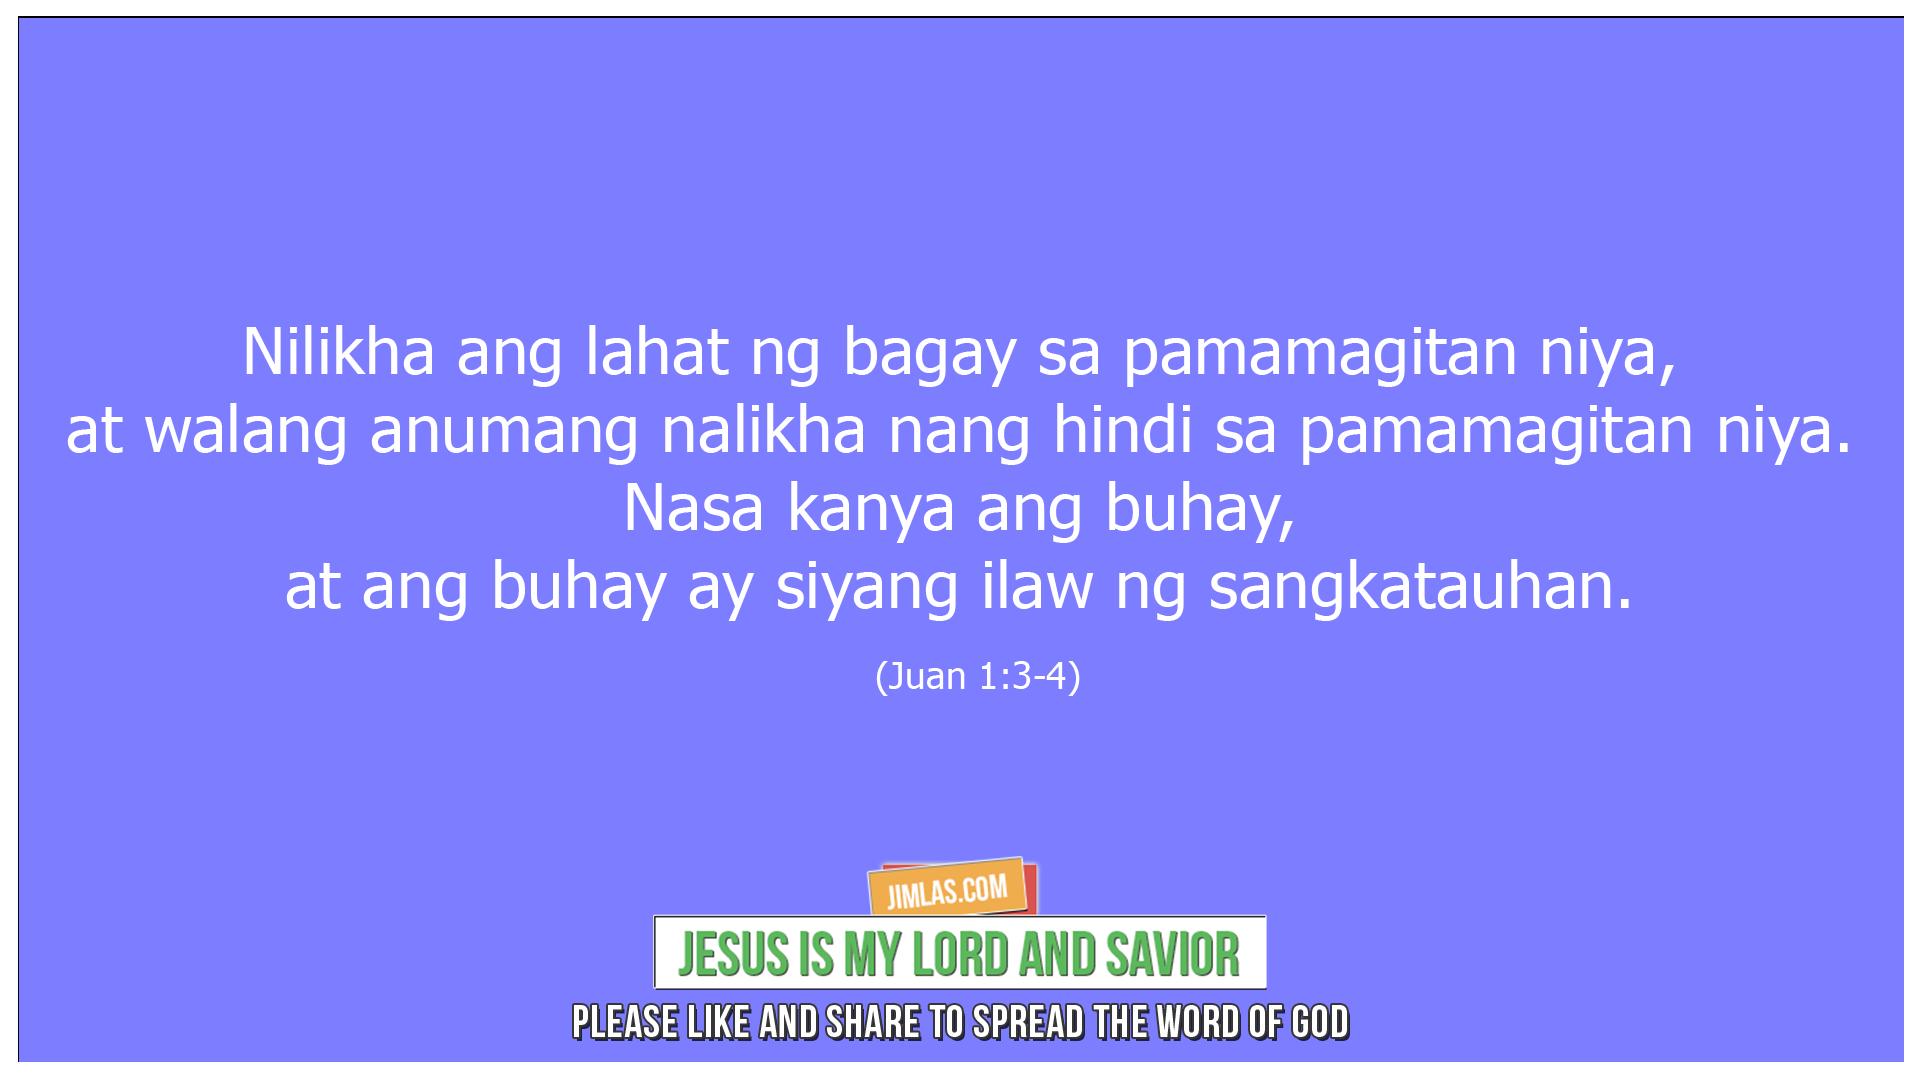 Juan 1 3-4, Juan 1:3-4